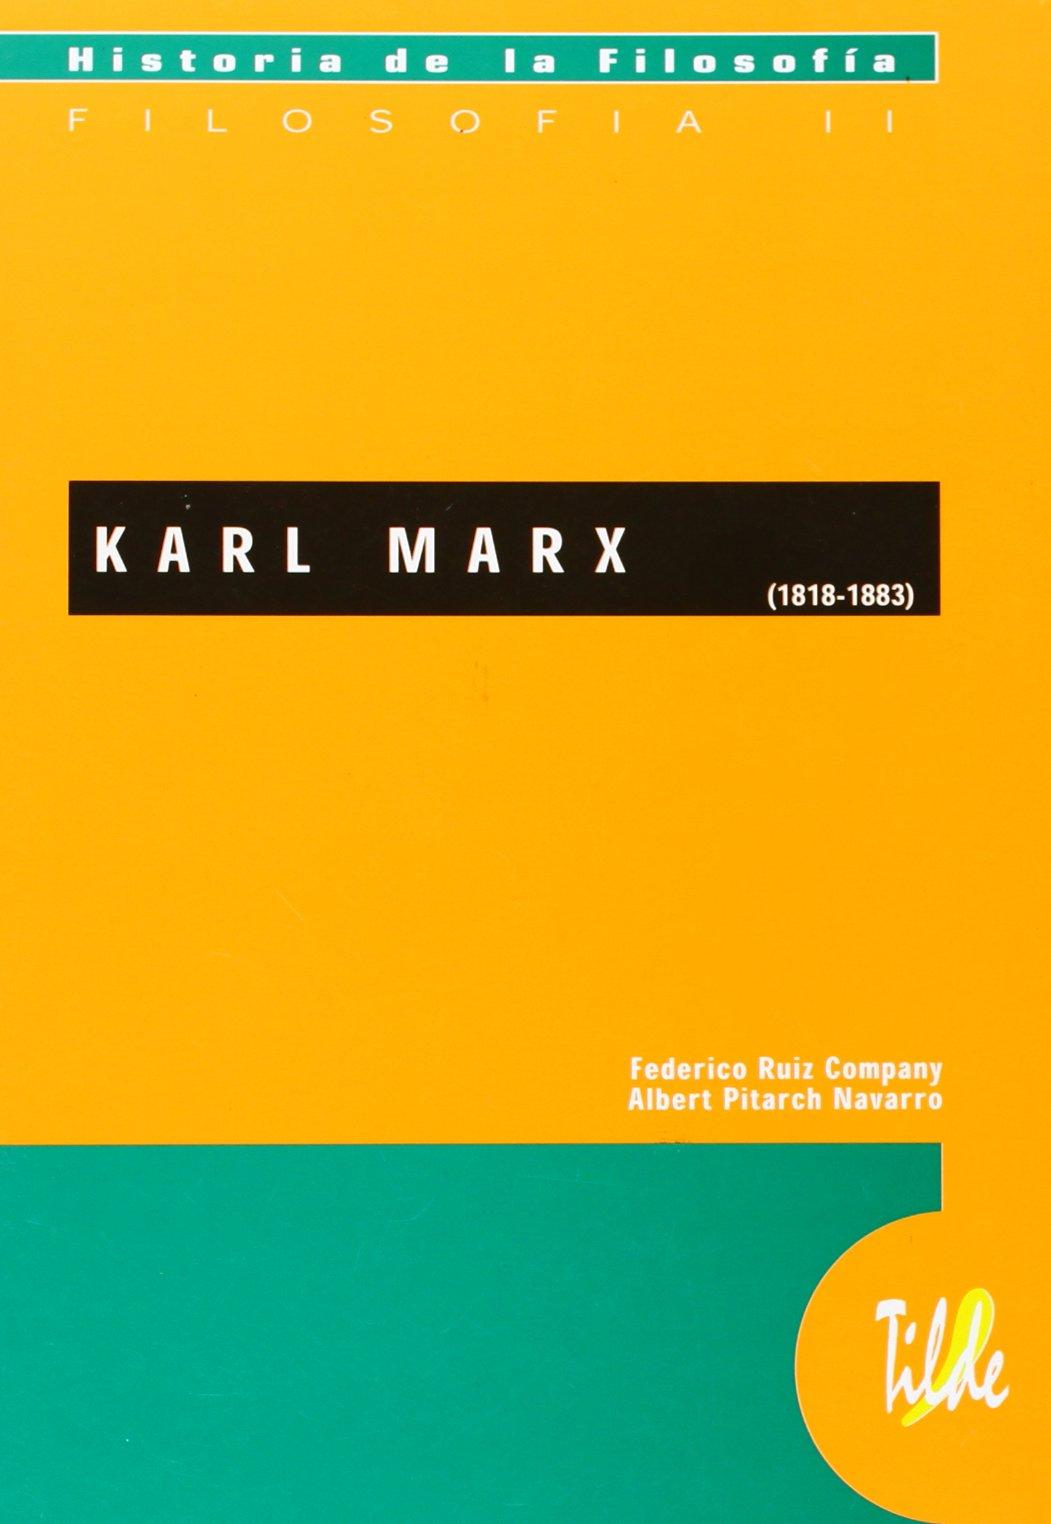 Download Karl Marx (1818-1883) Text fb2 ebook